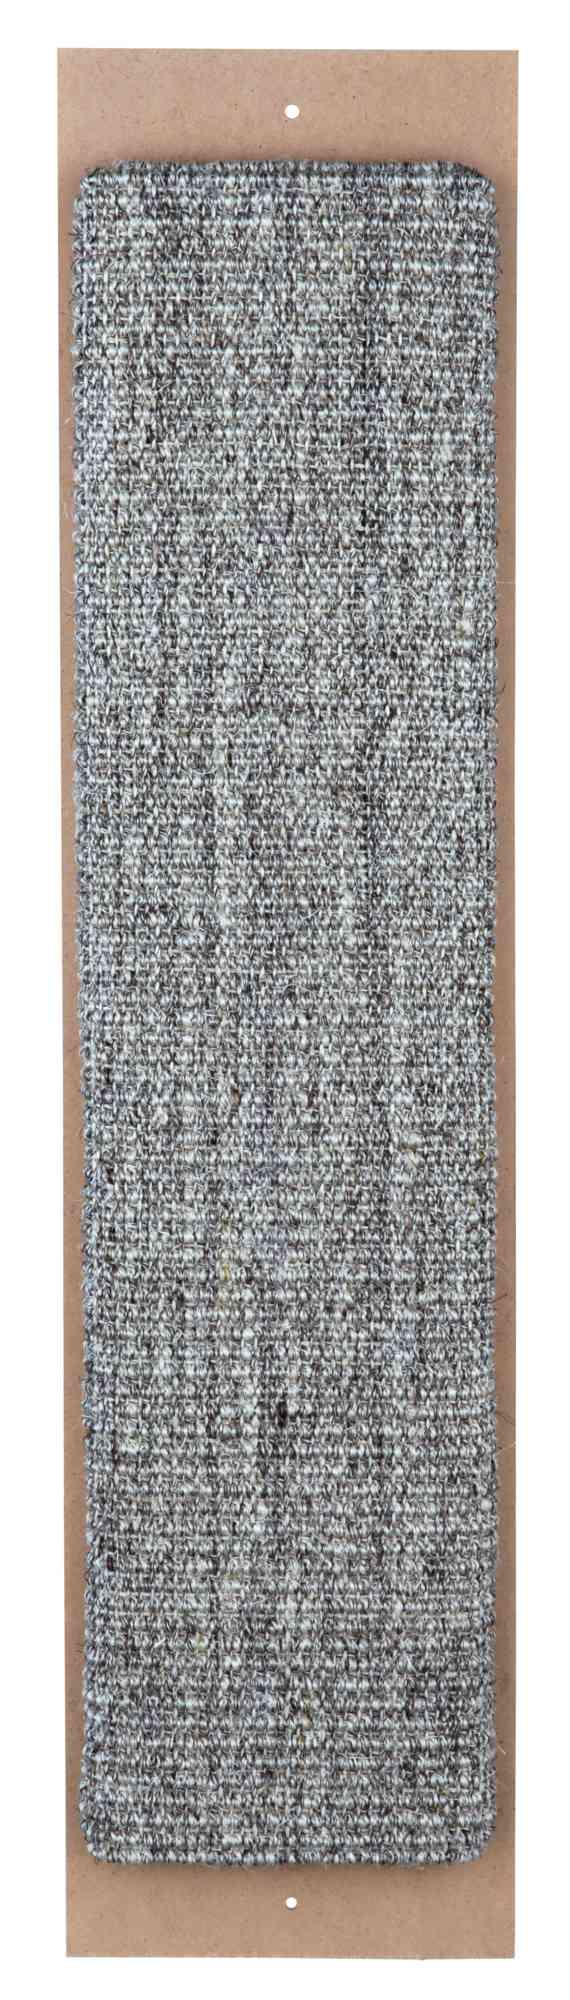 TRIXIE Kratzbrett XL TRIXIE Kratzbrett, Sisalteppich, Katzenminze, 17 × 70 cm, grau